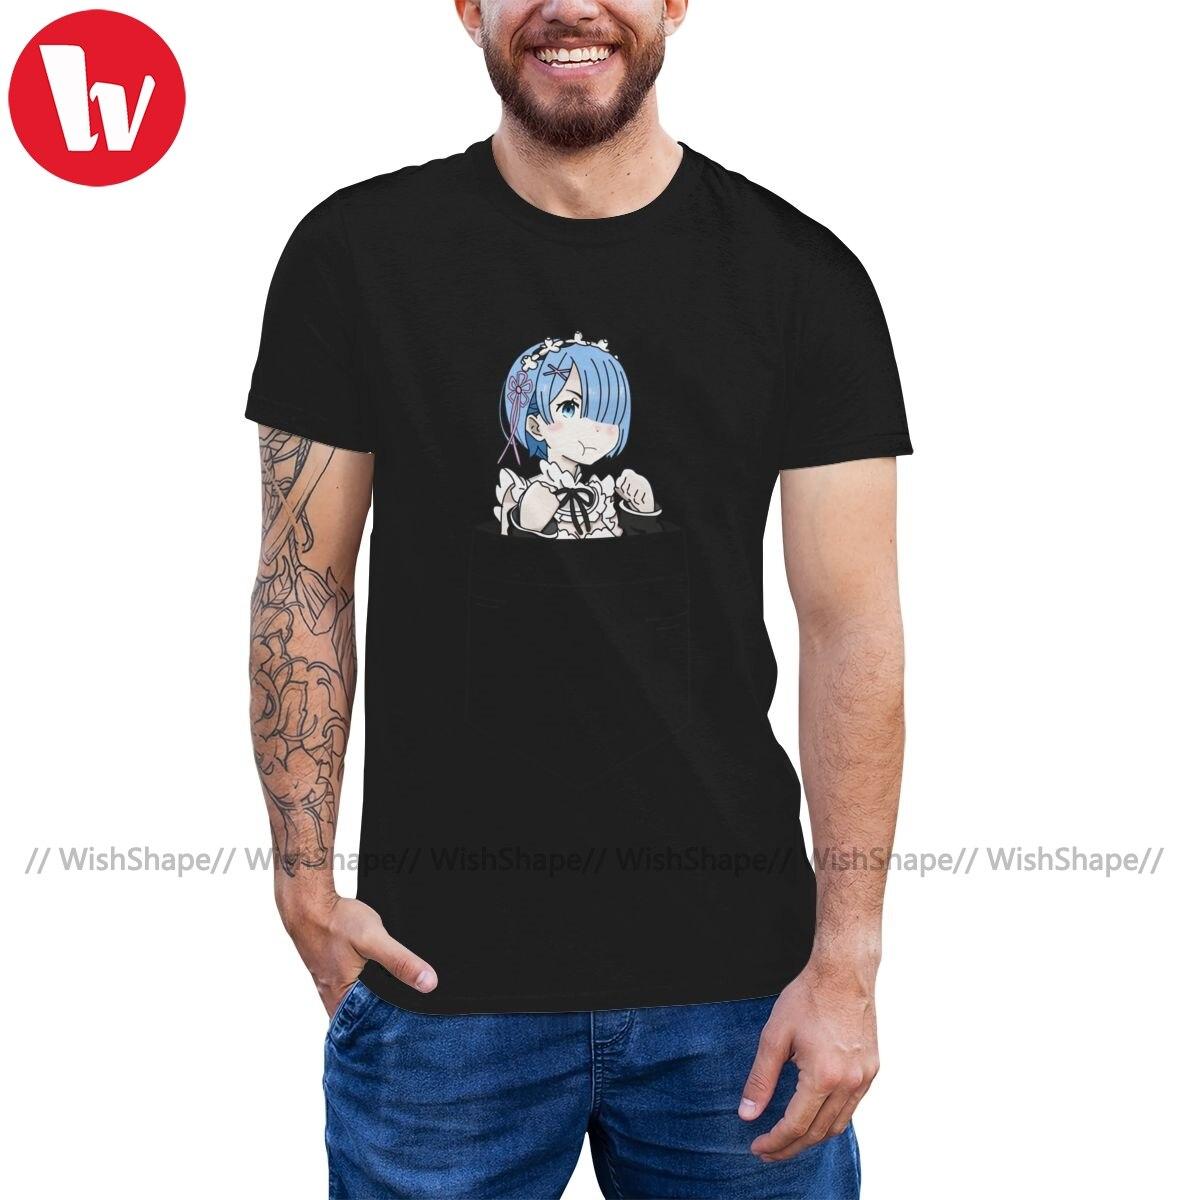 A cero T camisa Mini bolsillo camiseta Rem 100 algodón de verano de camiseta hombres lindo XXX de manga corta Camiseta